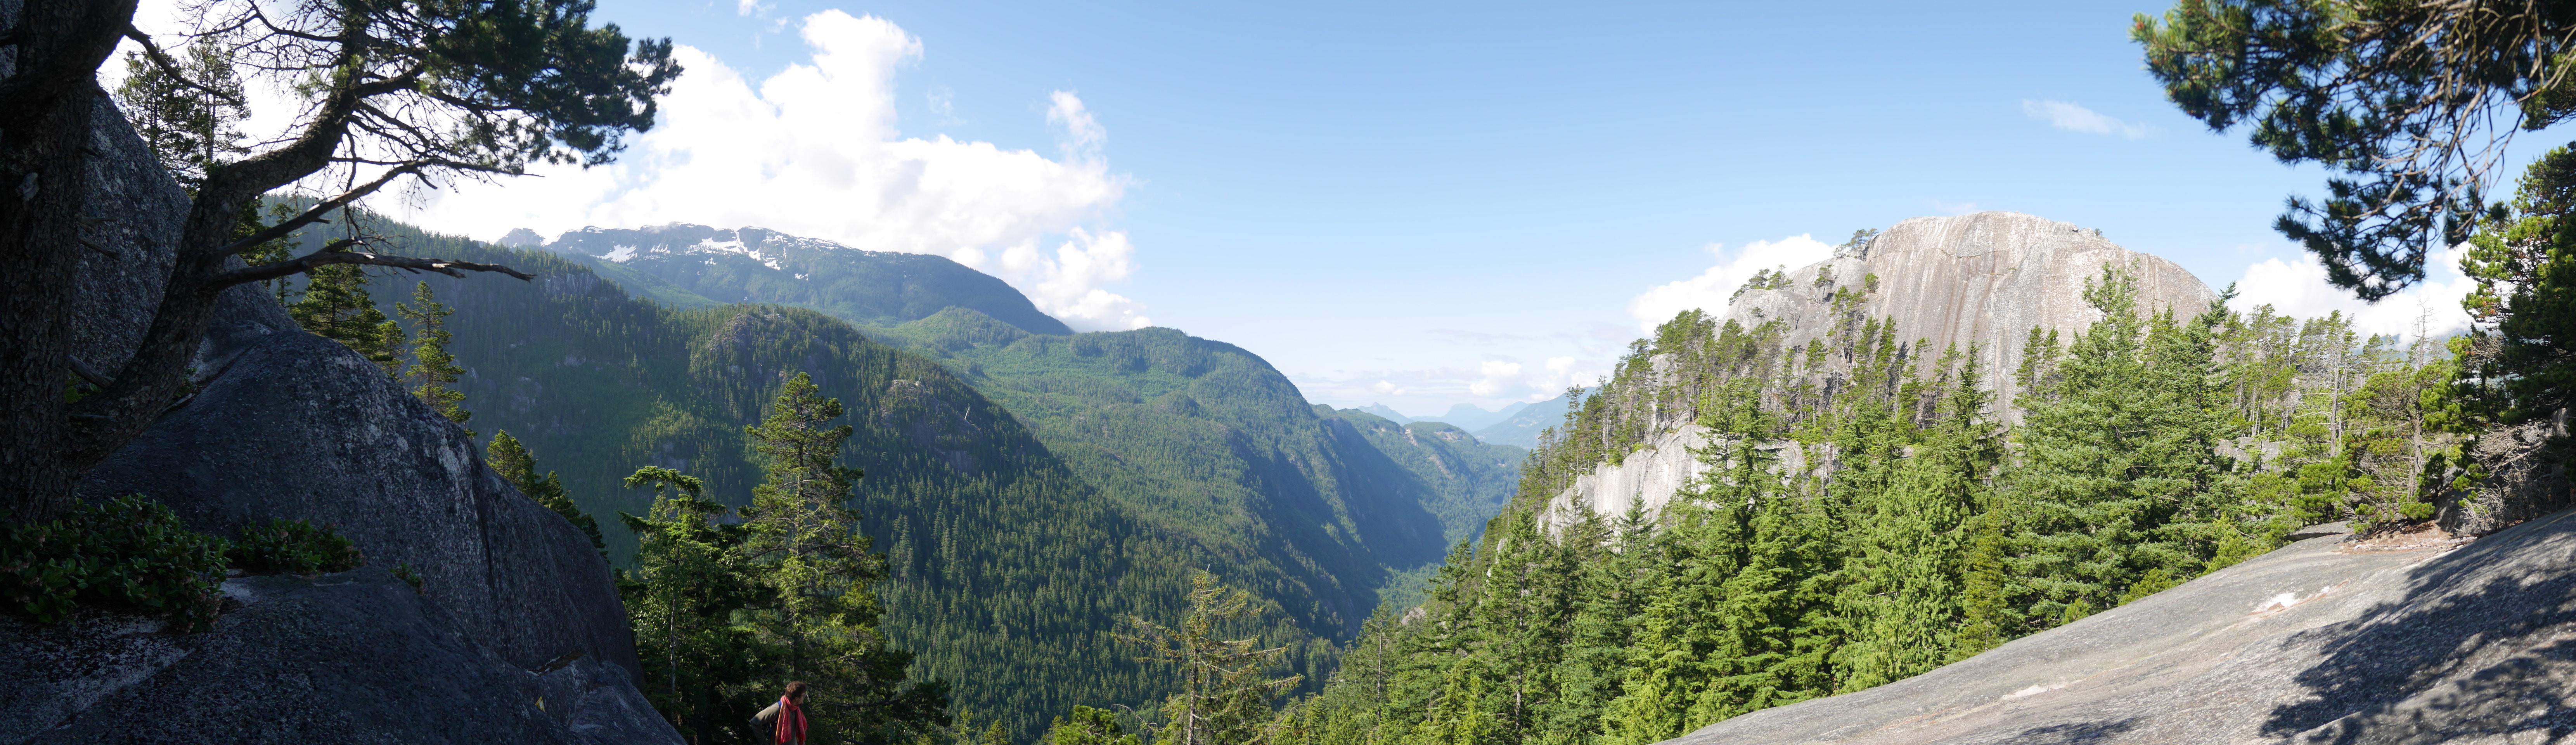 View to Stawamus Chief's first peak